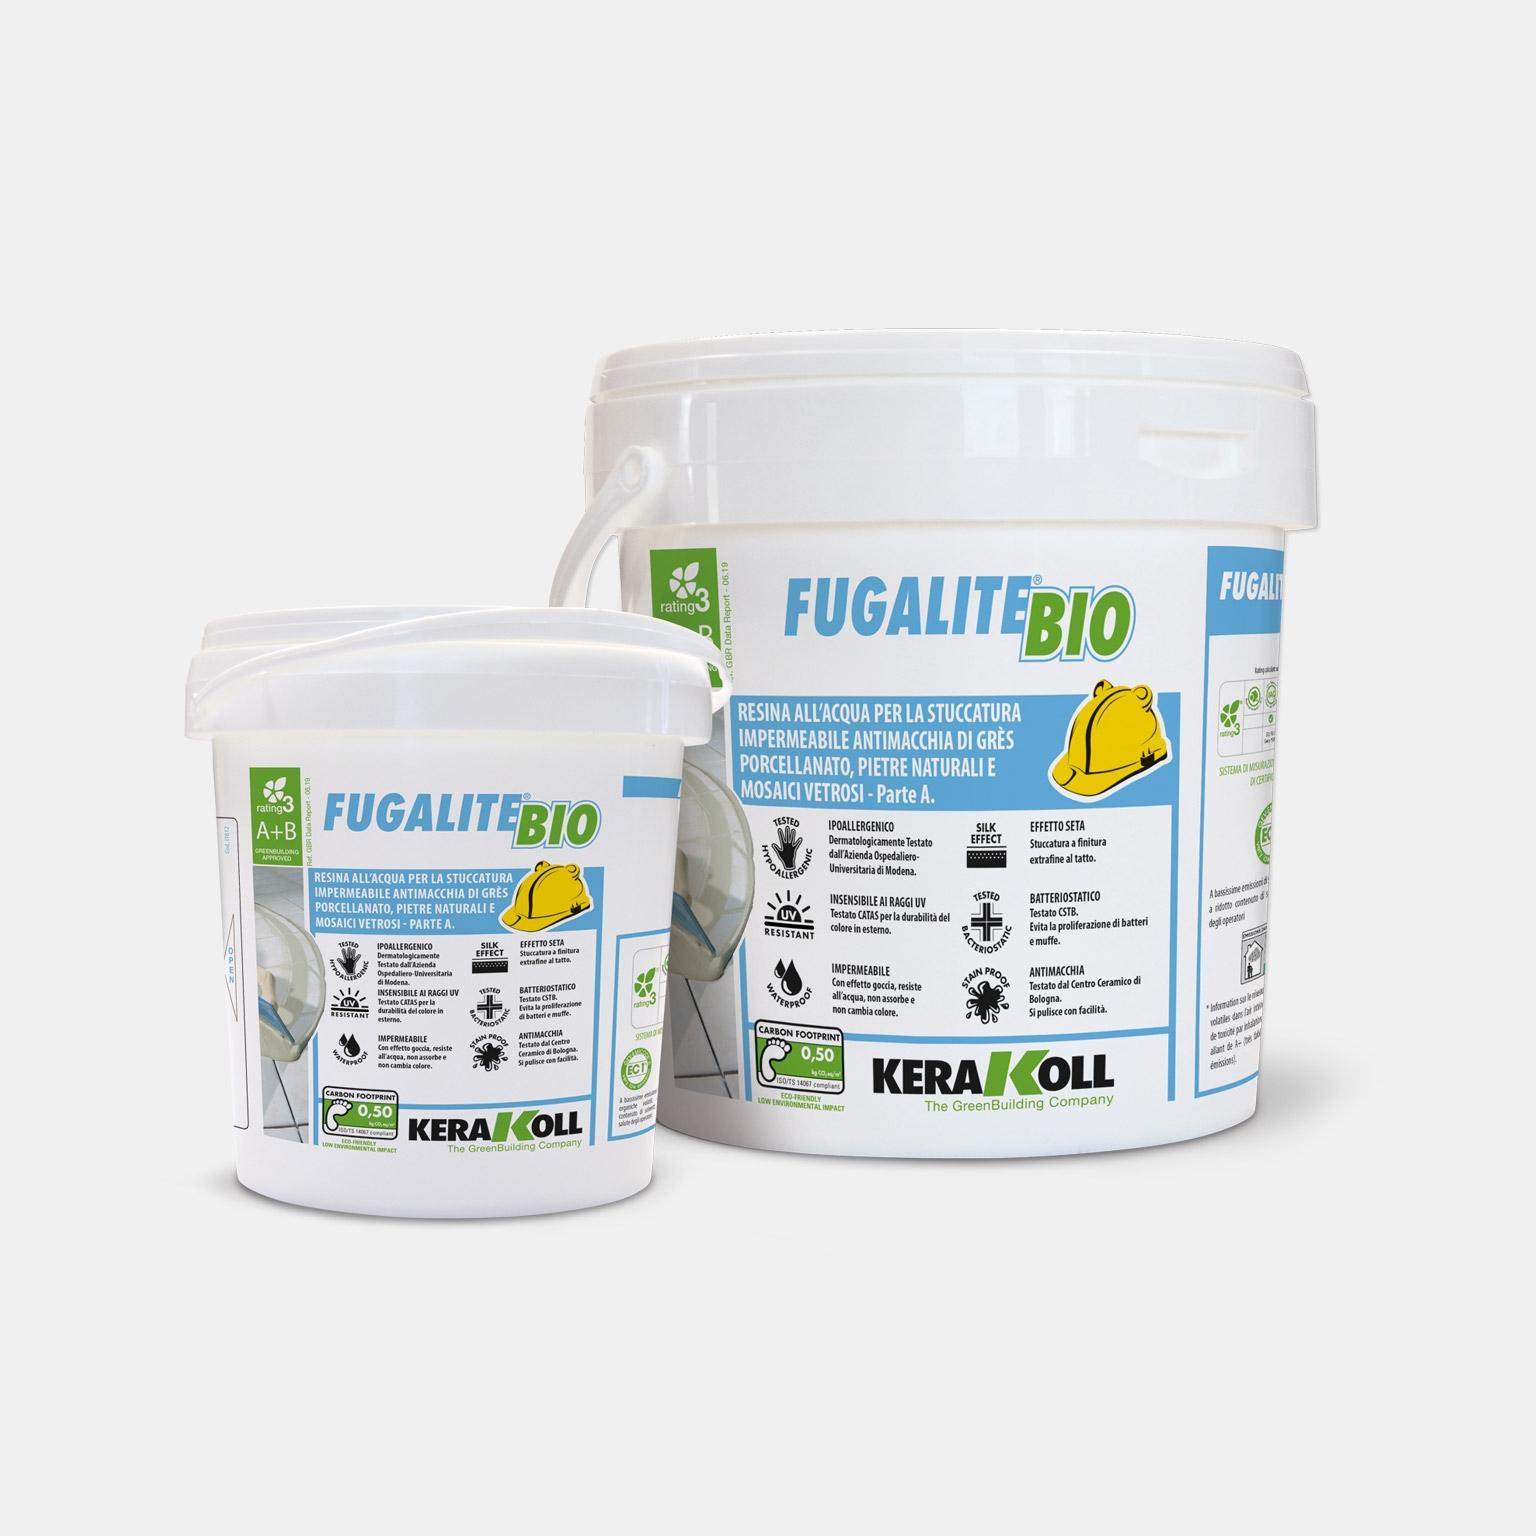 Fuga epoksydowa Kerakoll Fugalite Bio biały 01 3kg